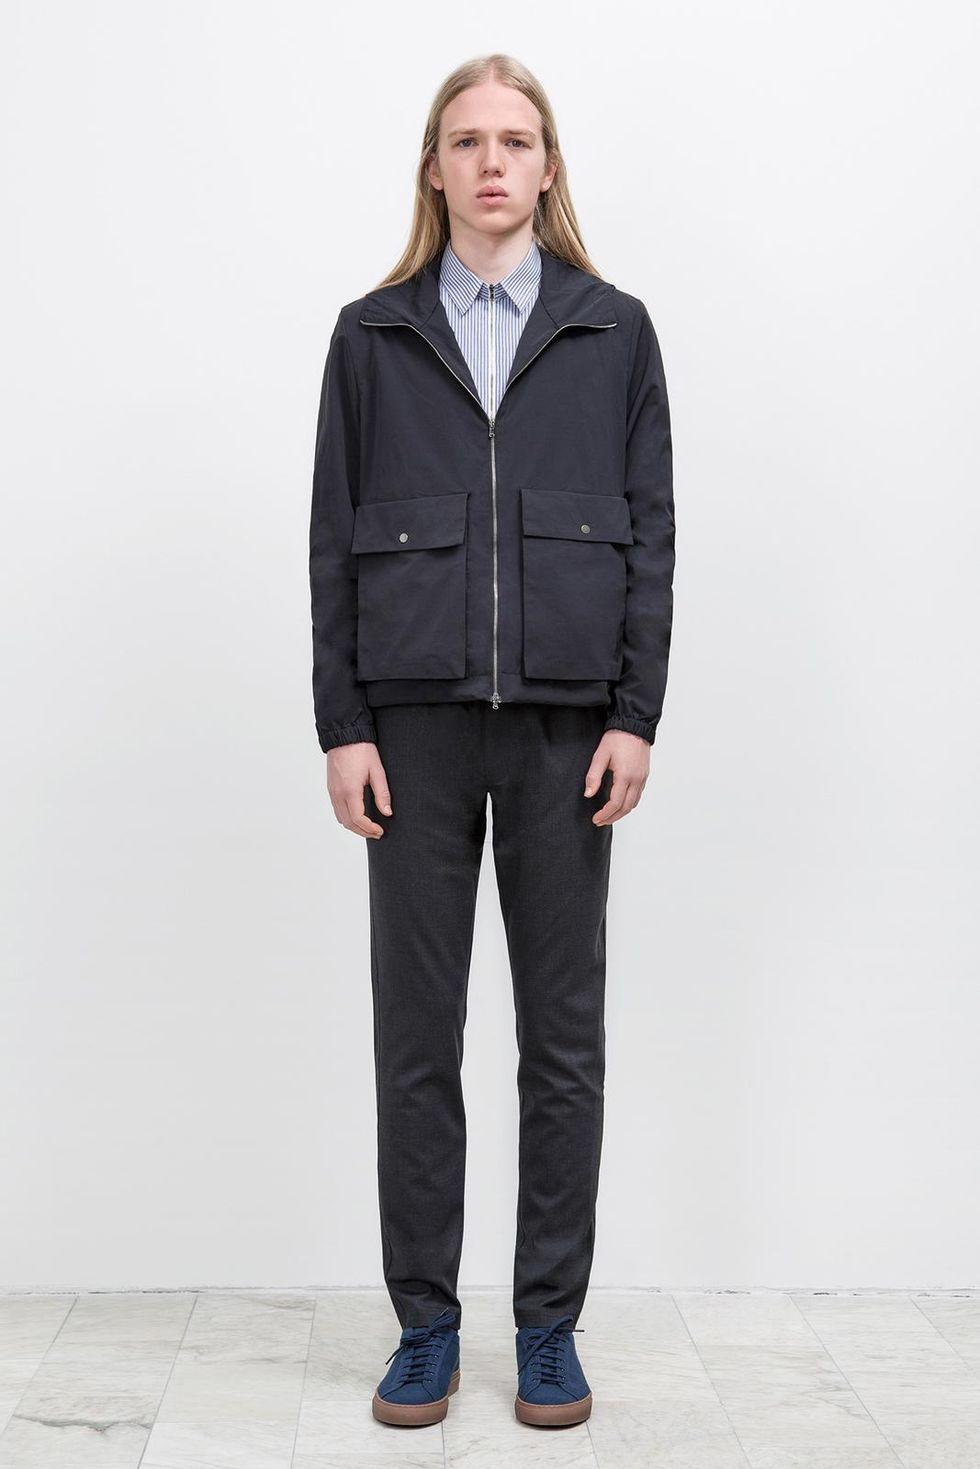 tres-bien-menswear-collection-spring-summer-2015-01.jpg